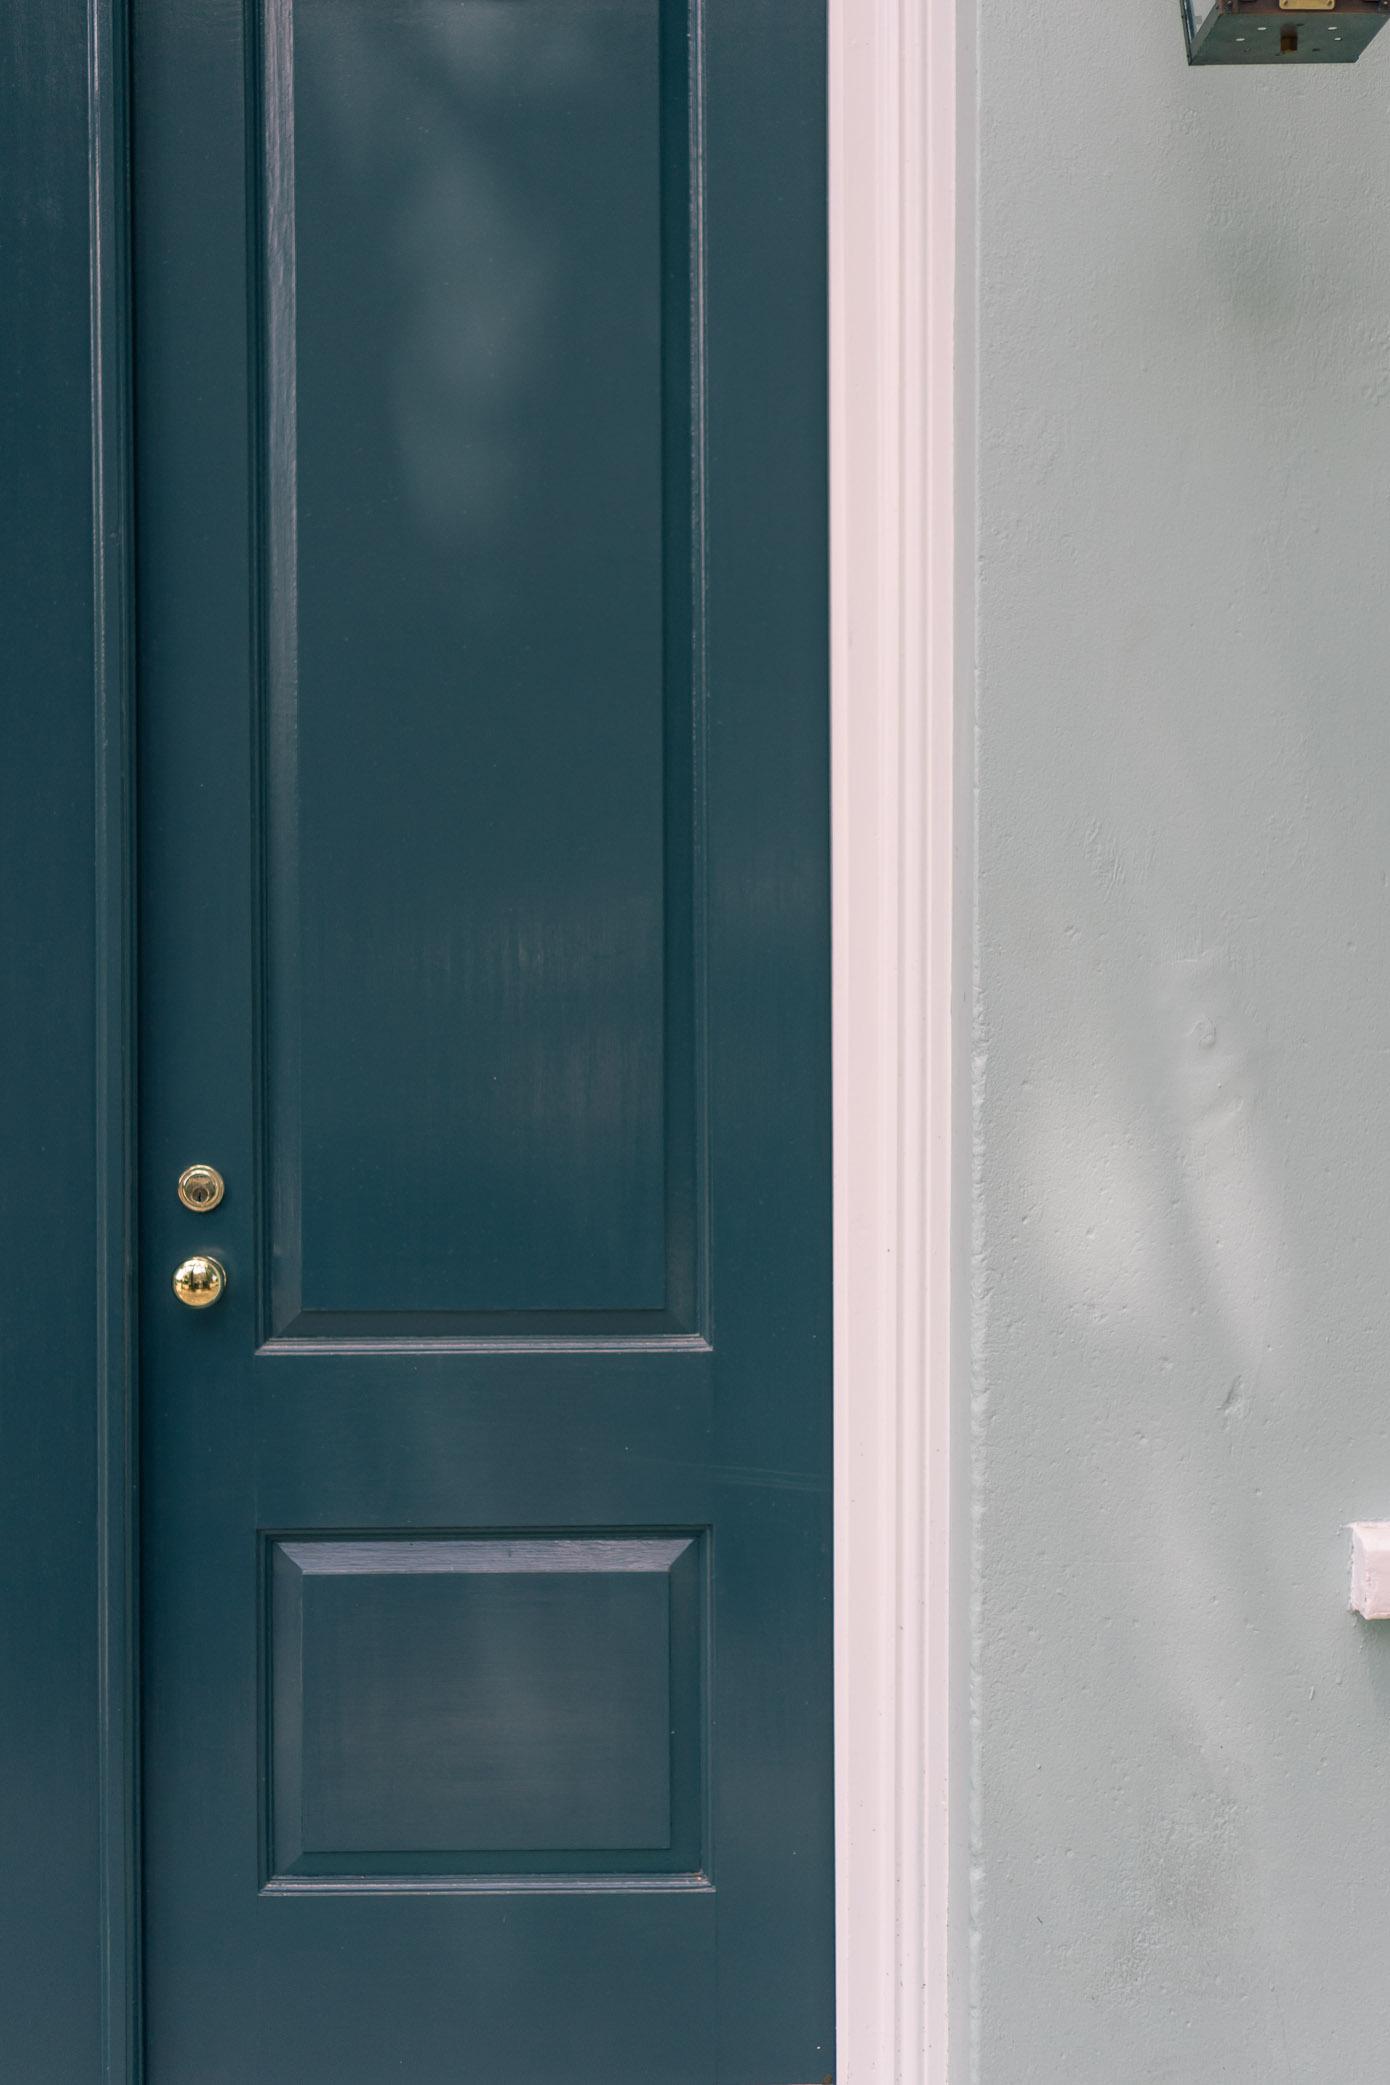 Charleston Front Doors | Navy Blue Front Door | Louella Reese Life & Style Blog